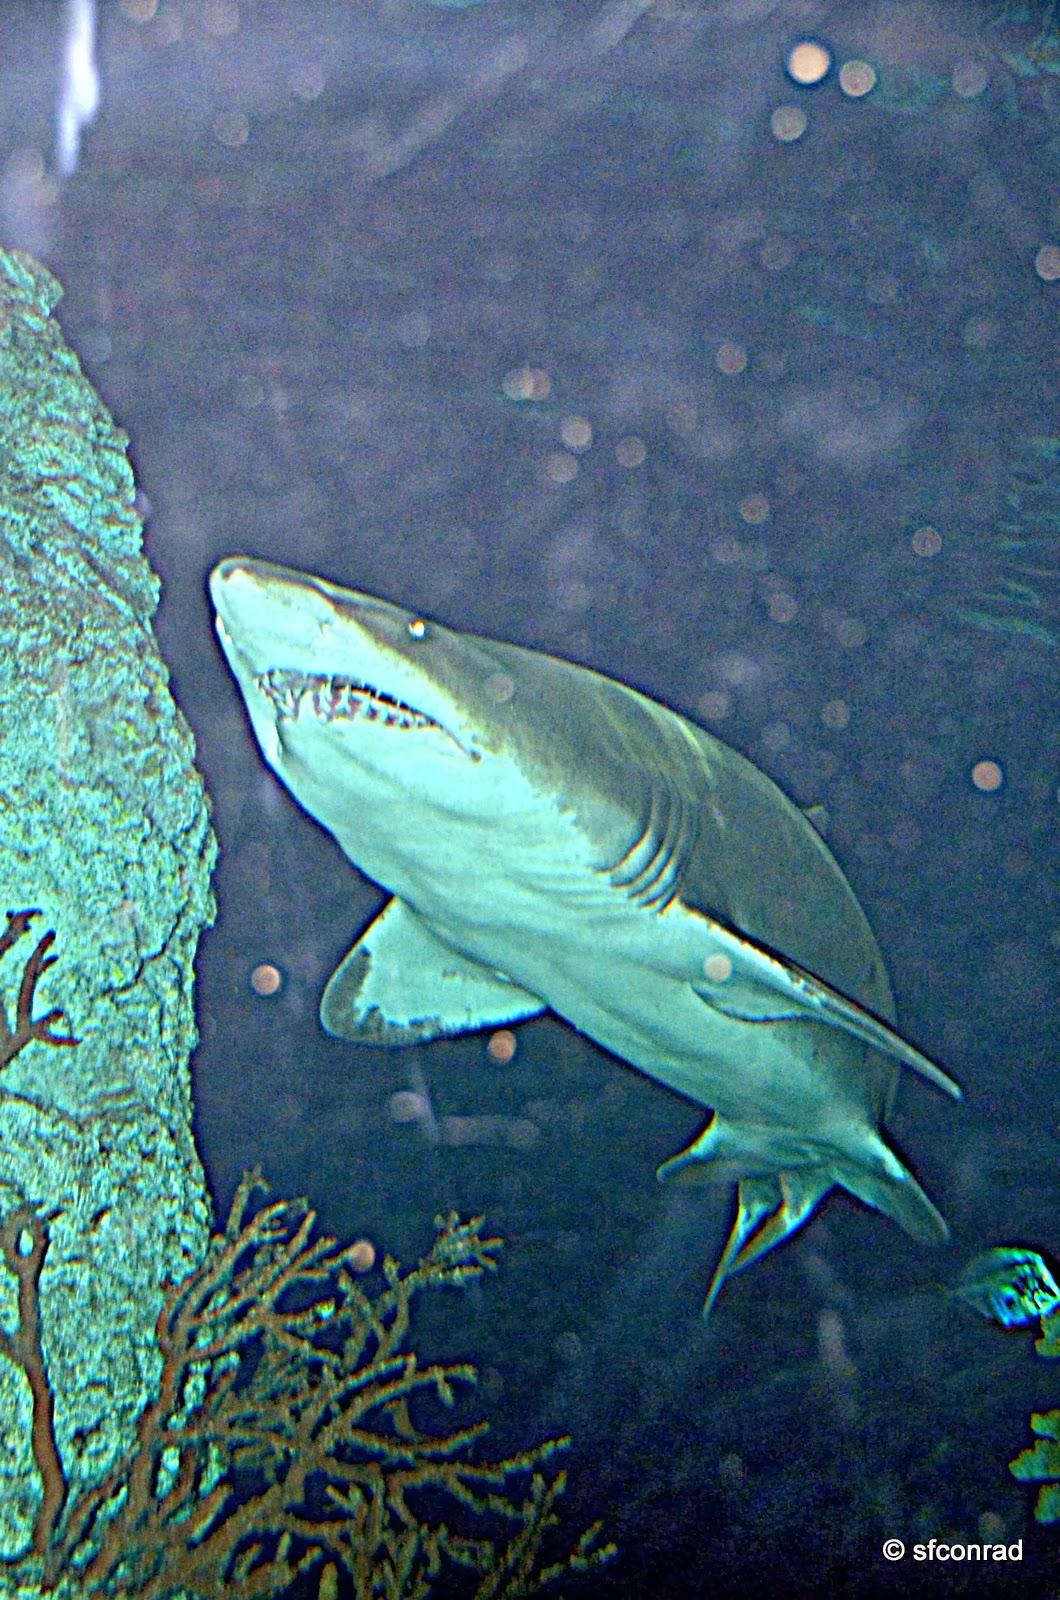 PUPPY PATHS RVing FullTime Moody Gardens Aquarium Pyramid